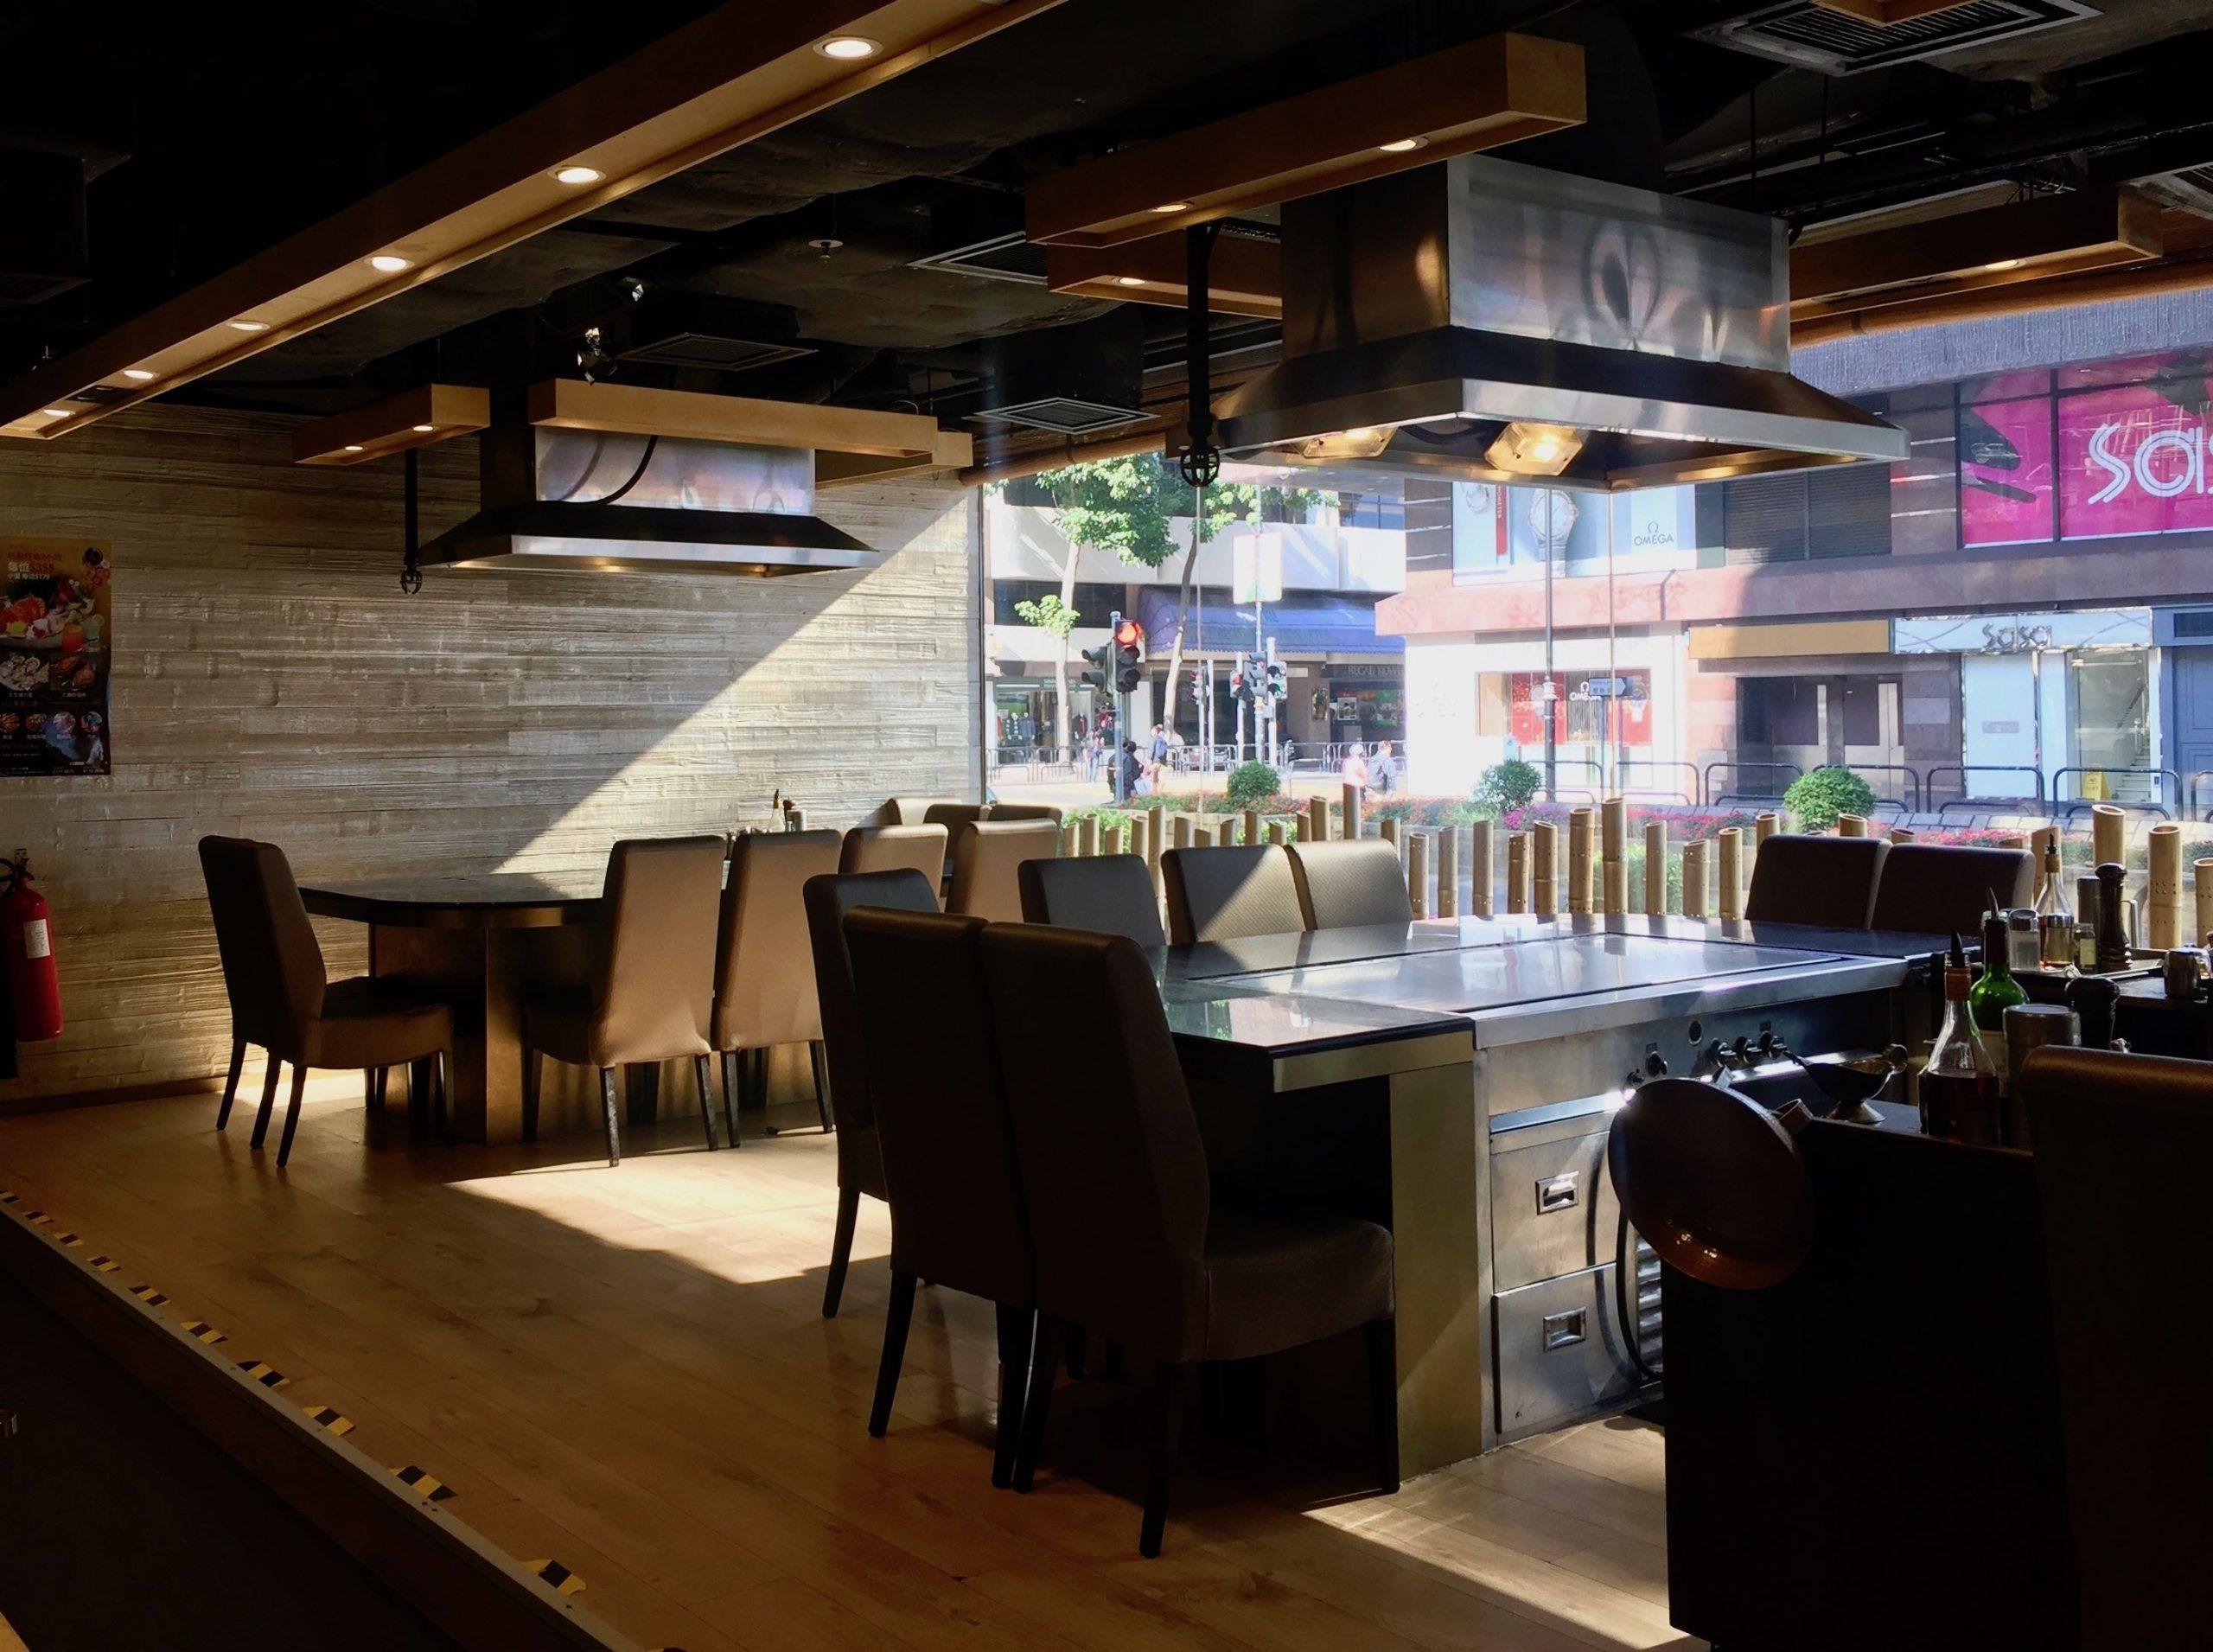 Tsim Sha Tsui Harbourfront Restaurant for Rent HK